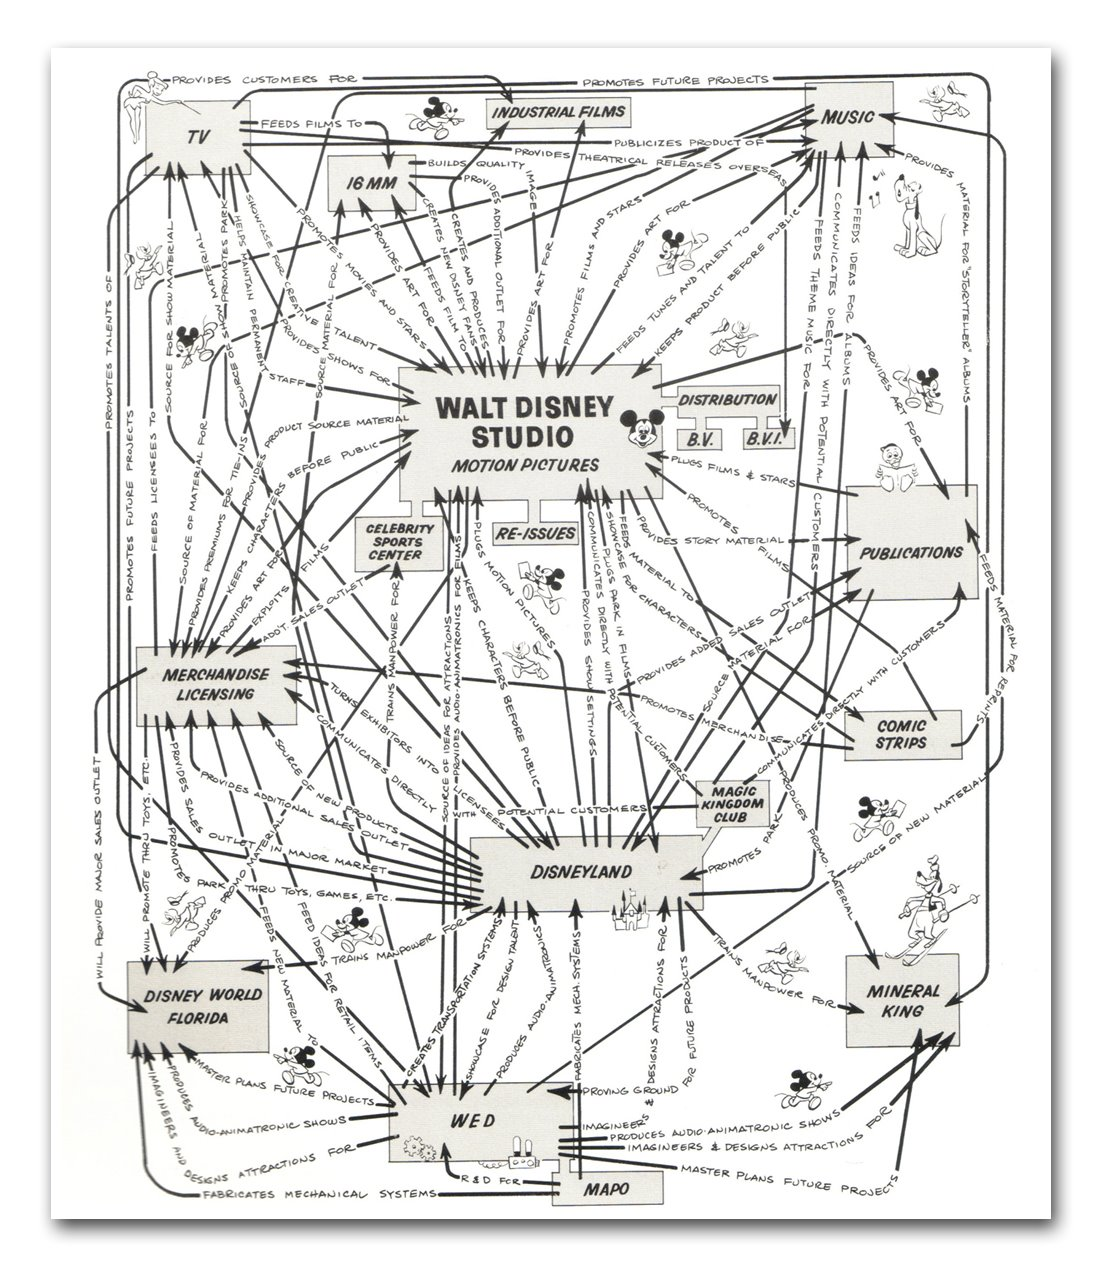 Walt Disney Productions Organizational Synergy Diagram